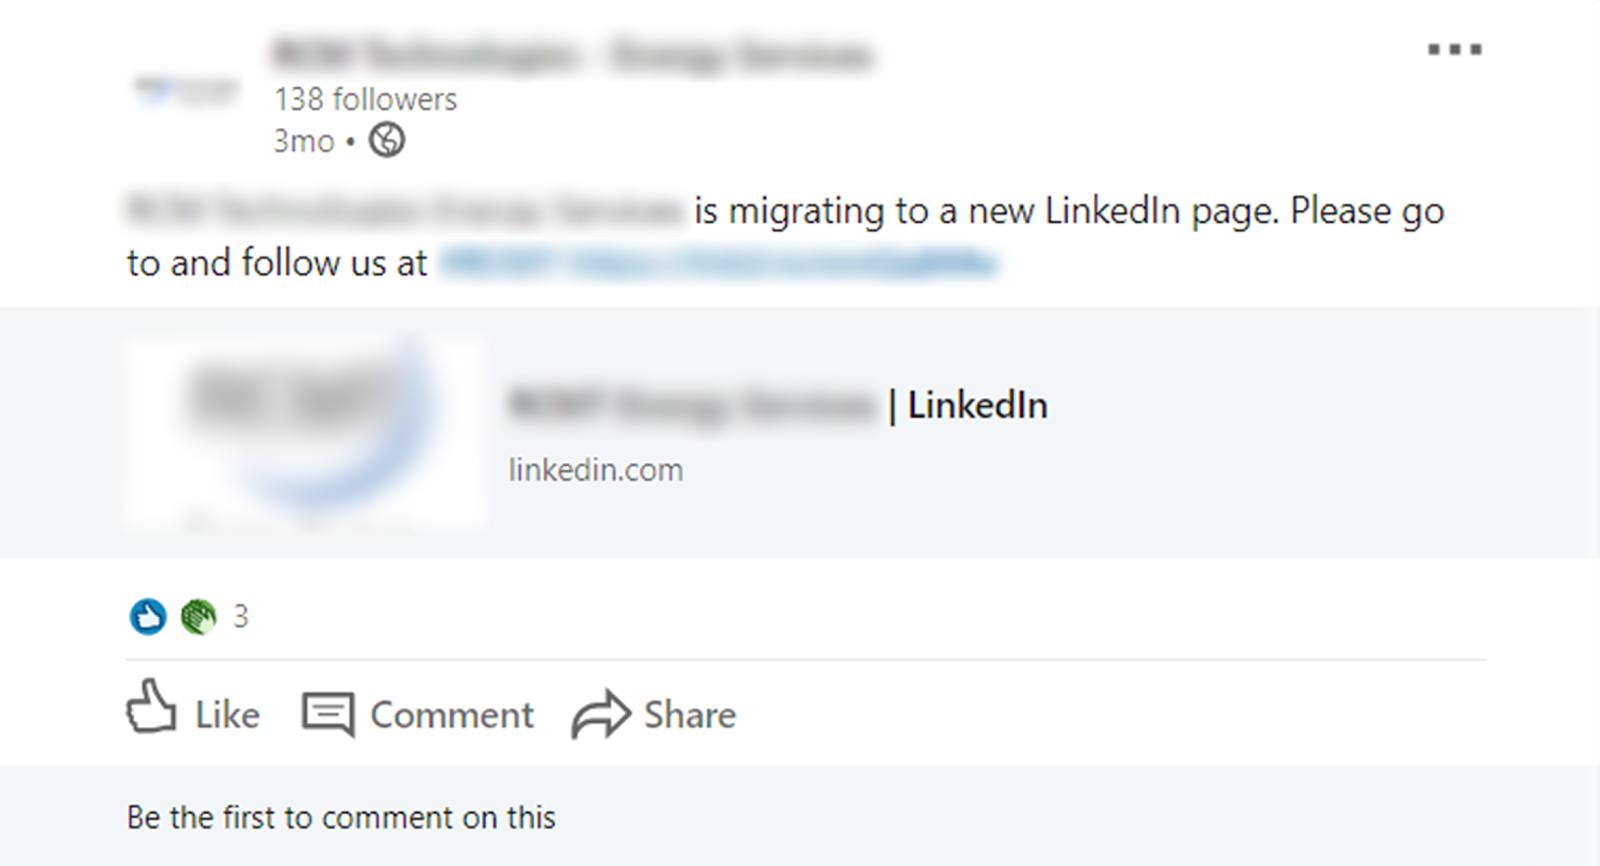 migration notification by a former linkedin admin